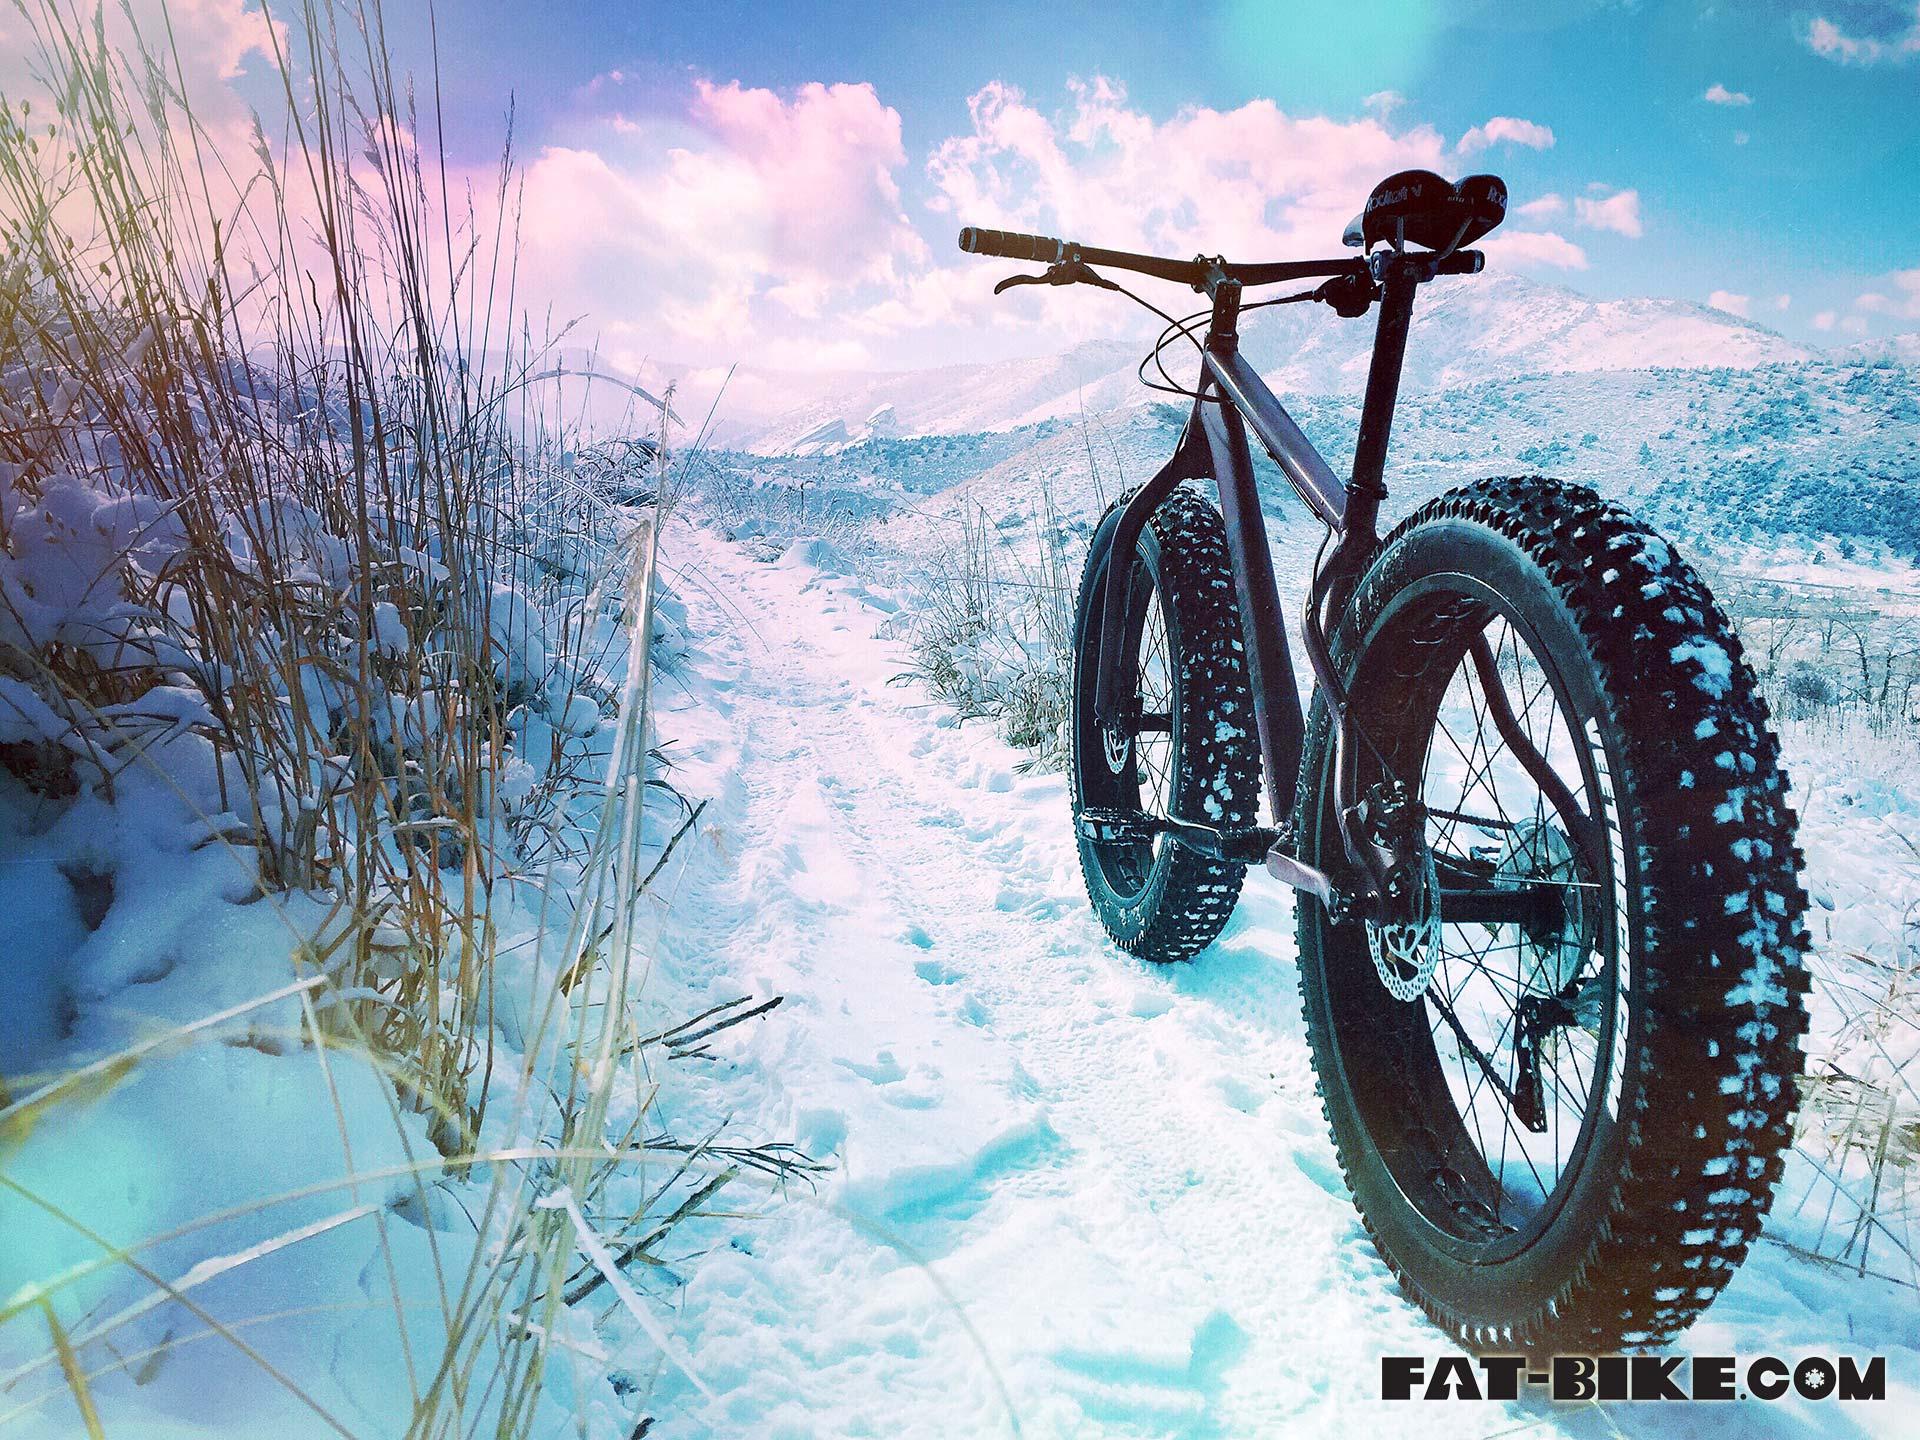 Wallpaper Wednesday Golden Colorado Fat bike FAT BIKECOM 1920x1440